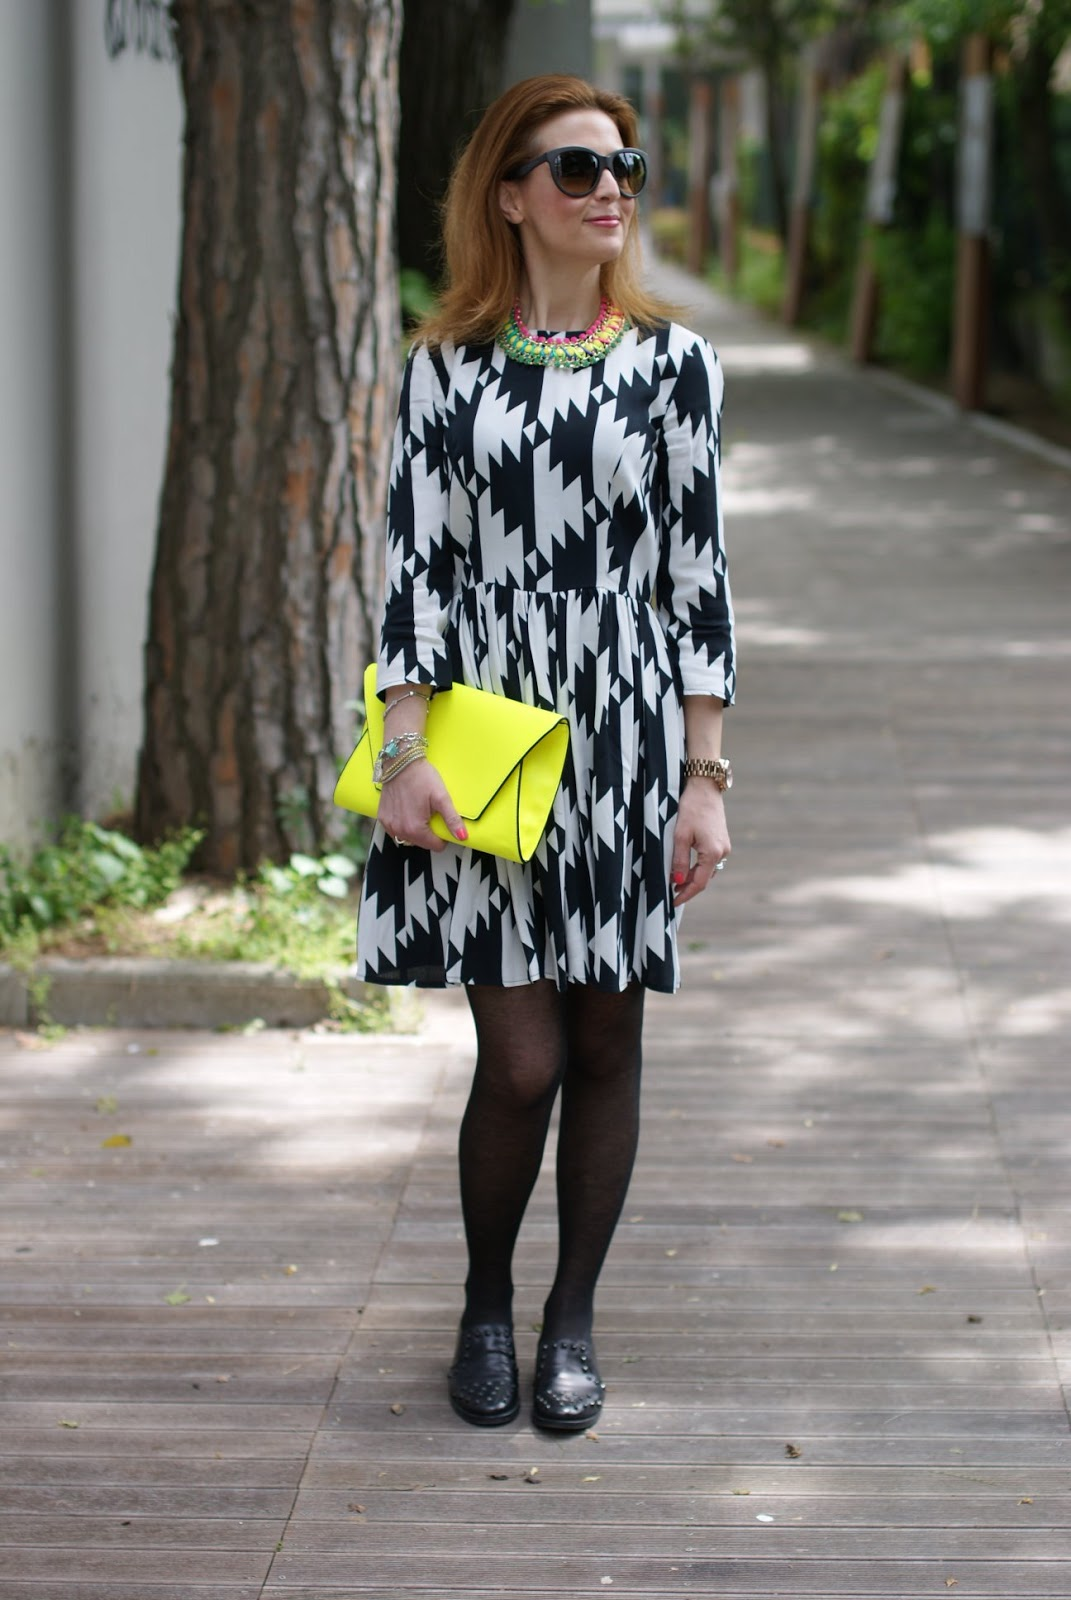 Piccoli Stivali E Sopra Lei black and white dress, yellow clutch | fashion and cookies